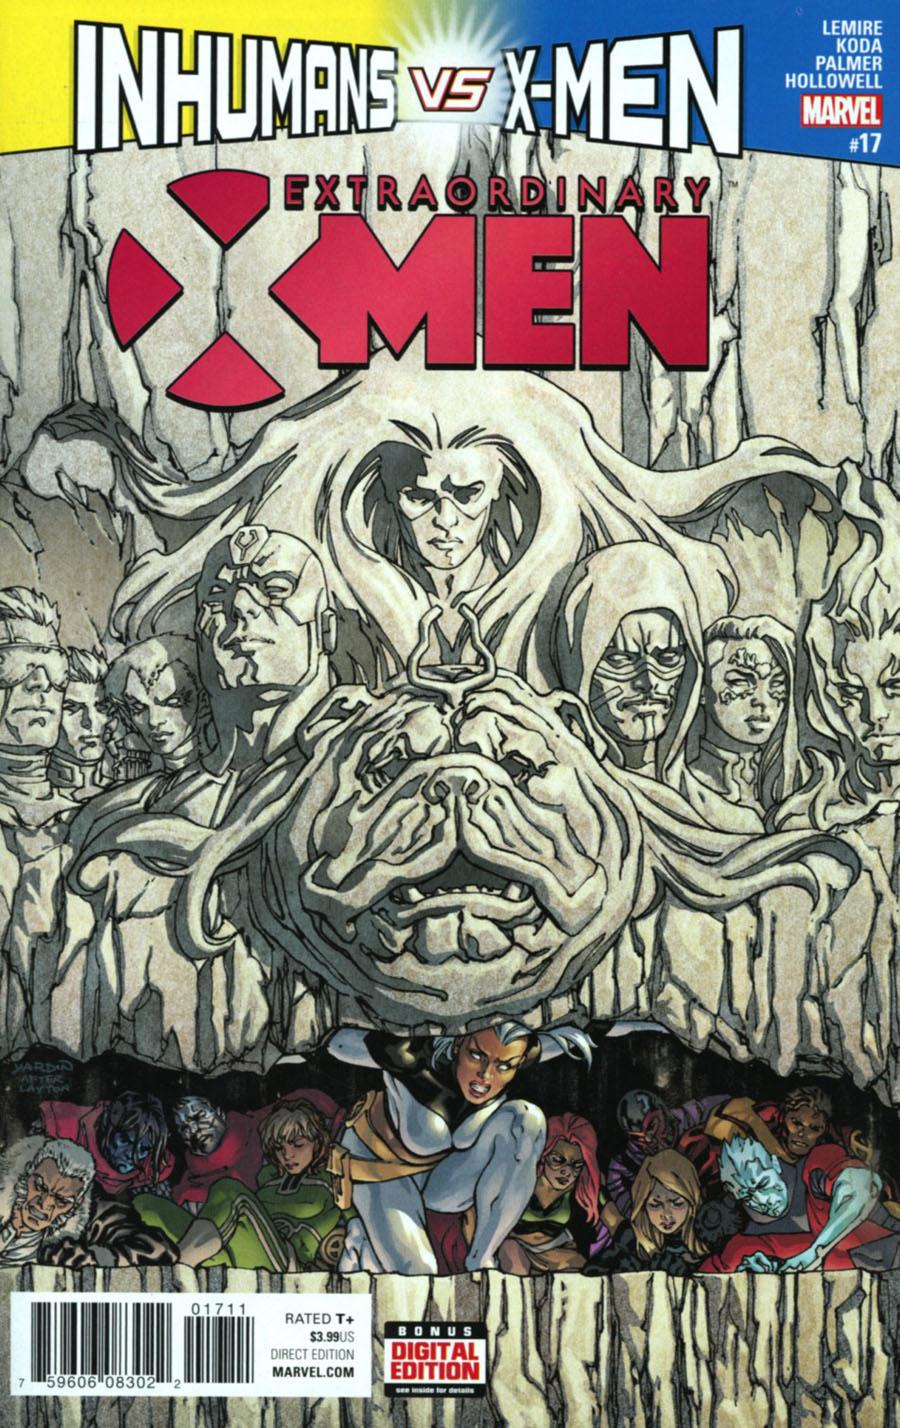 Extraordinary X-Men #17 Cover A Regular David Yardin Cover (Inhumans vs X-Men Tie-In)